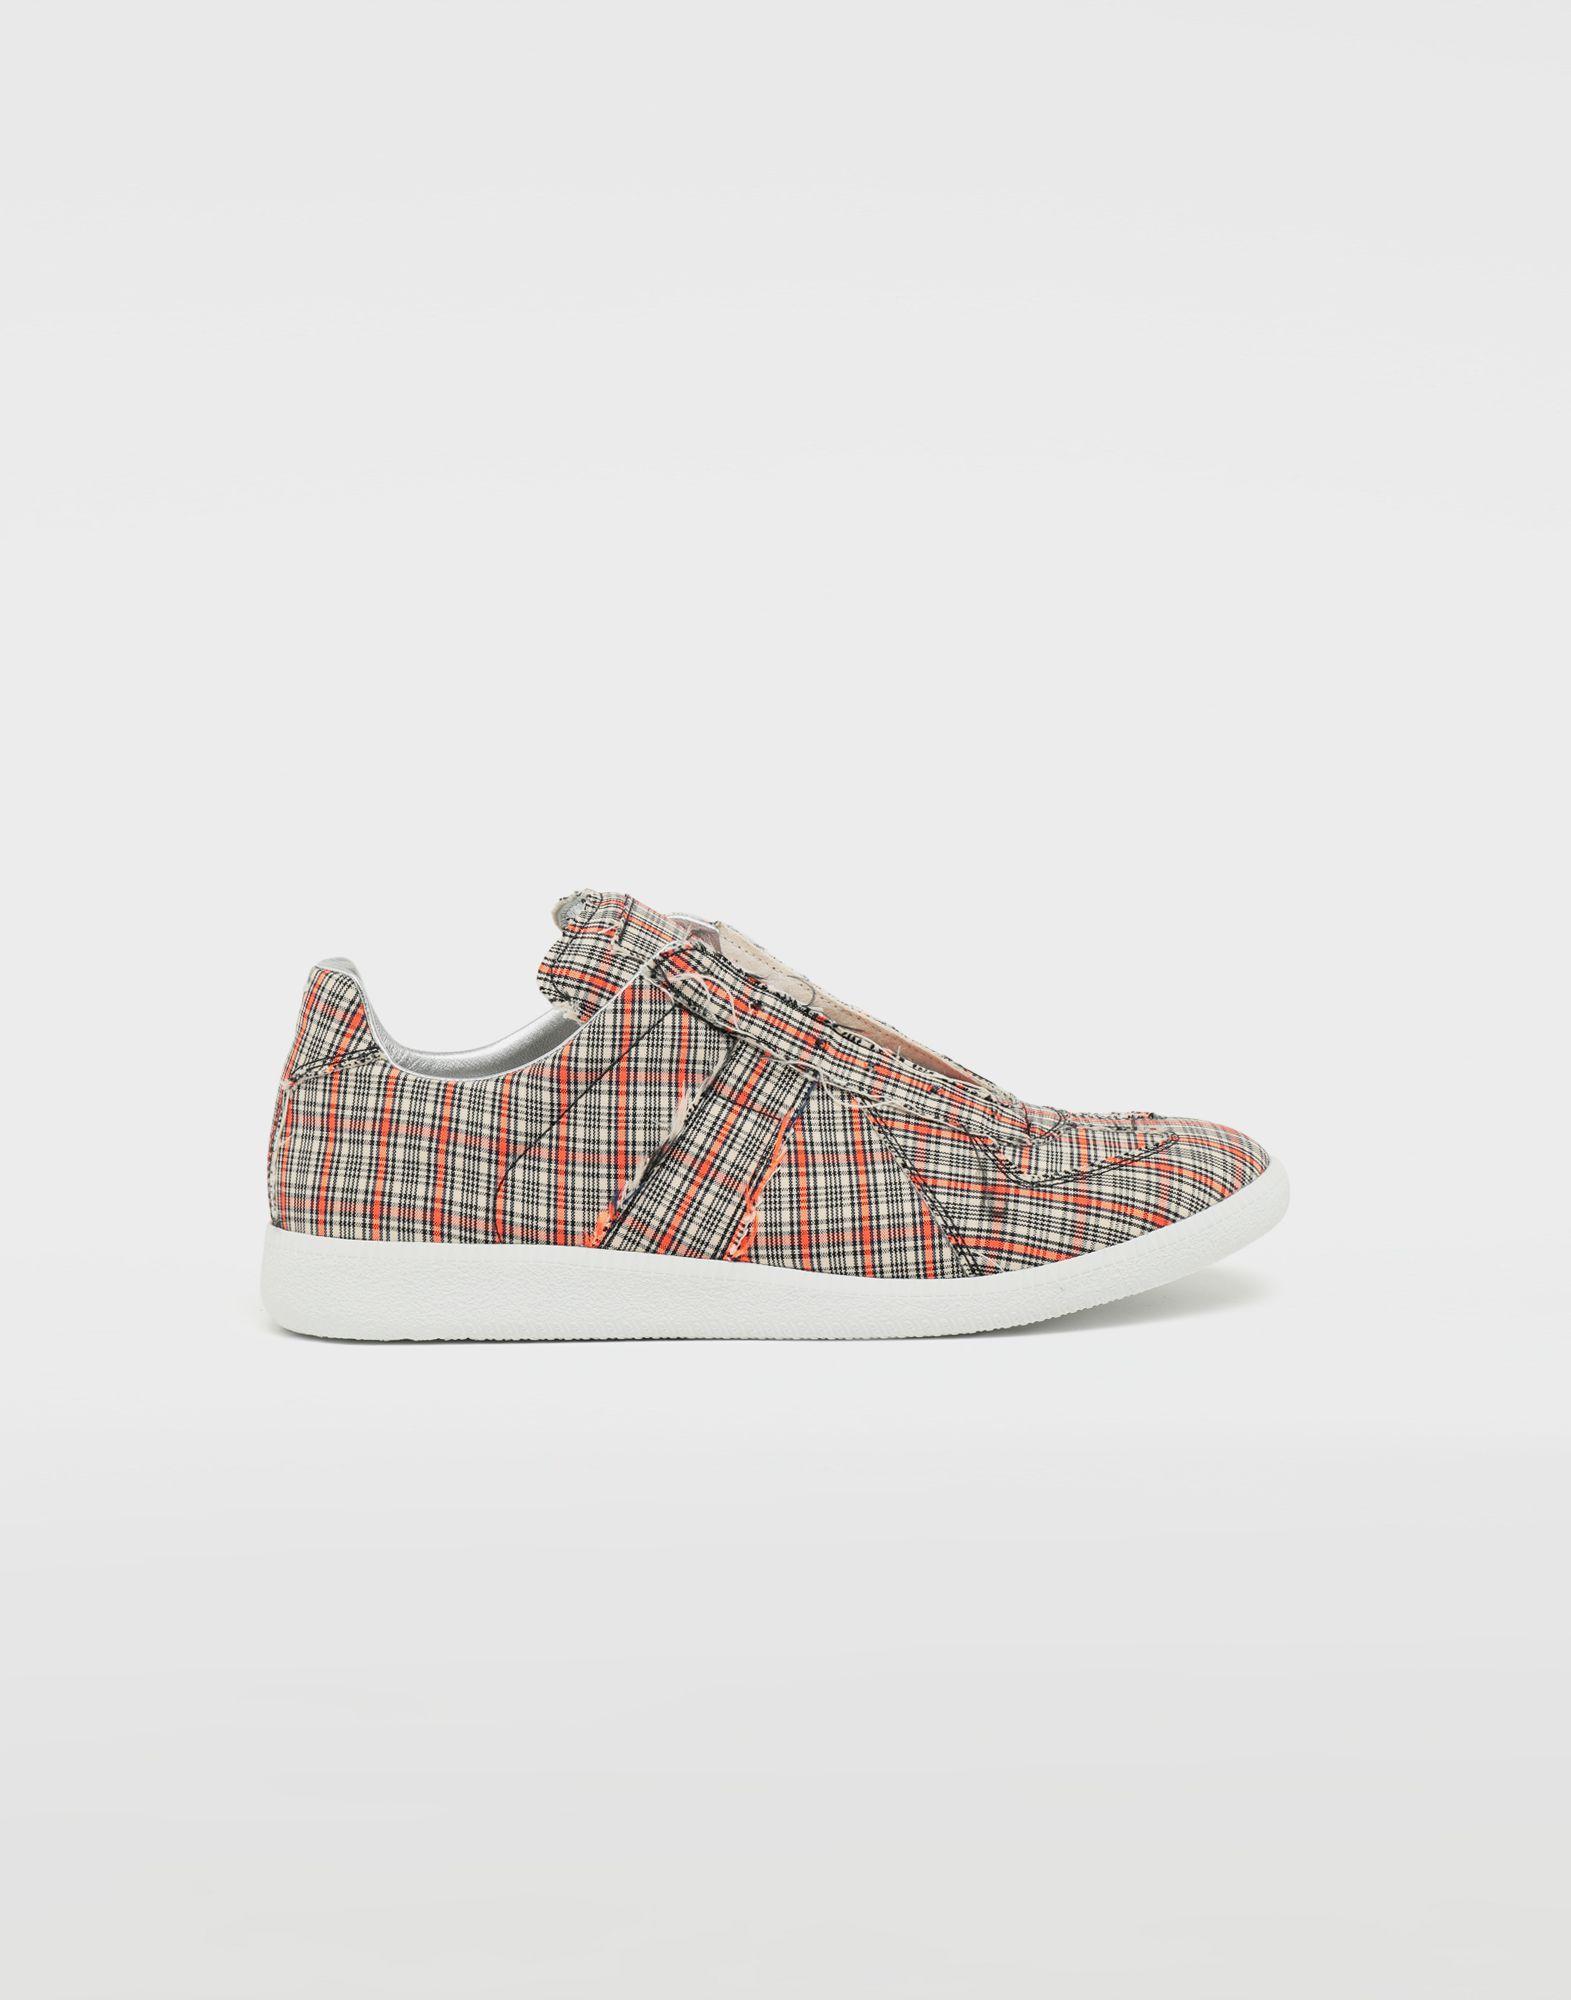 MAISON MARGIELA Replica low top check sneakers Sneakers Man f